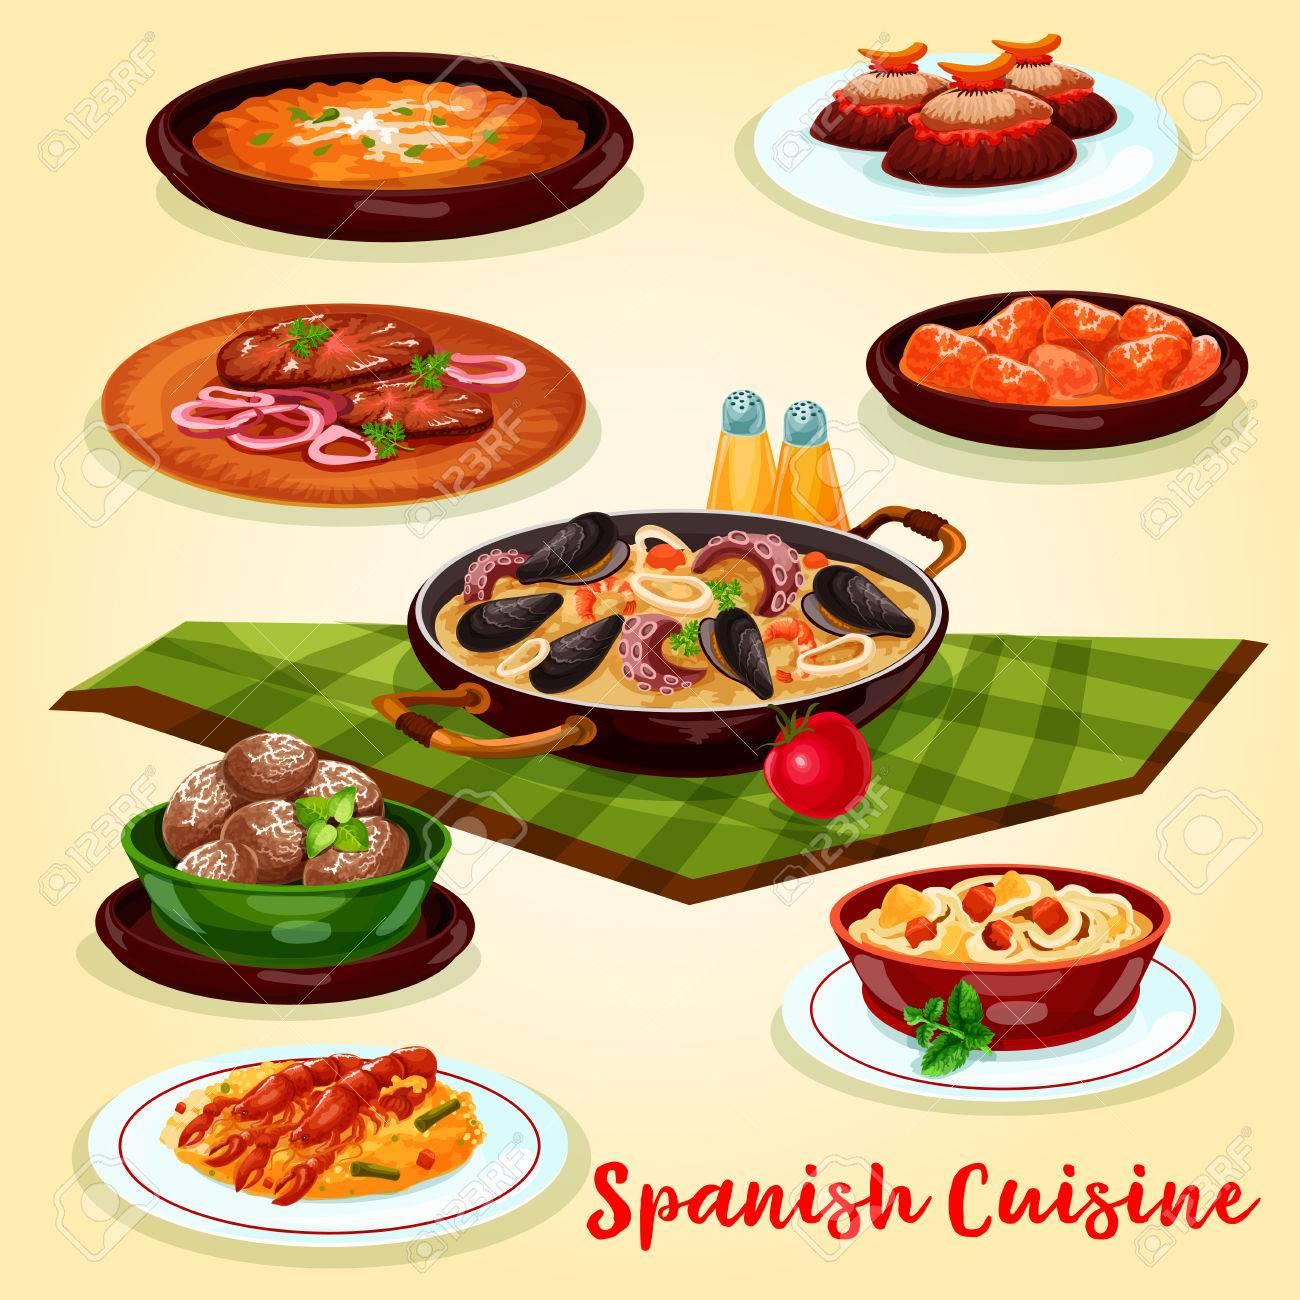 Dessin Paella affiche de dessin animé du menu diner du menu espagnol. paella de